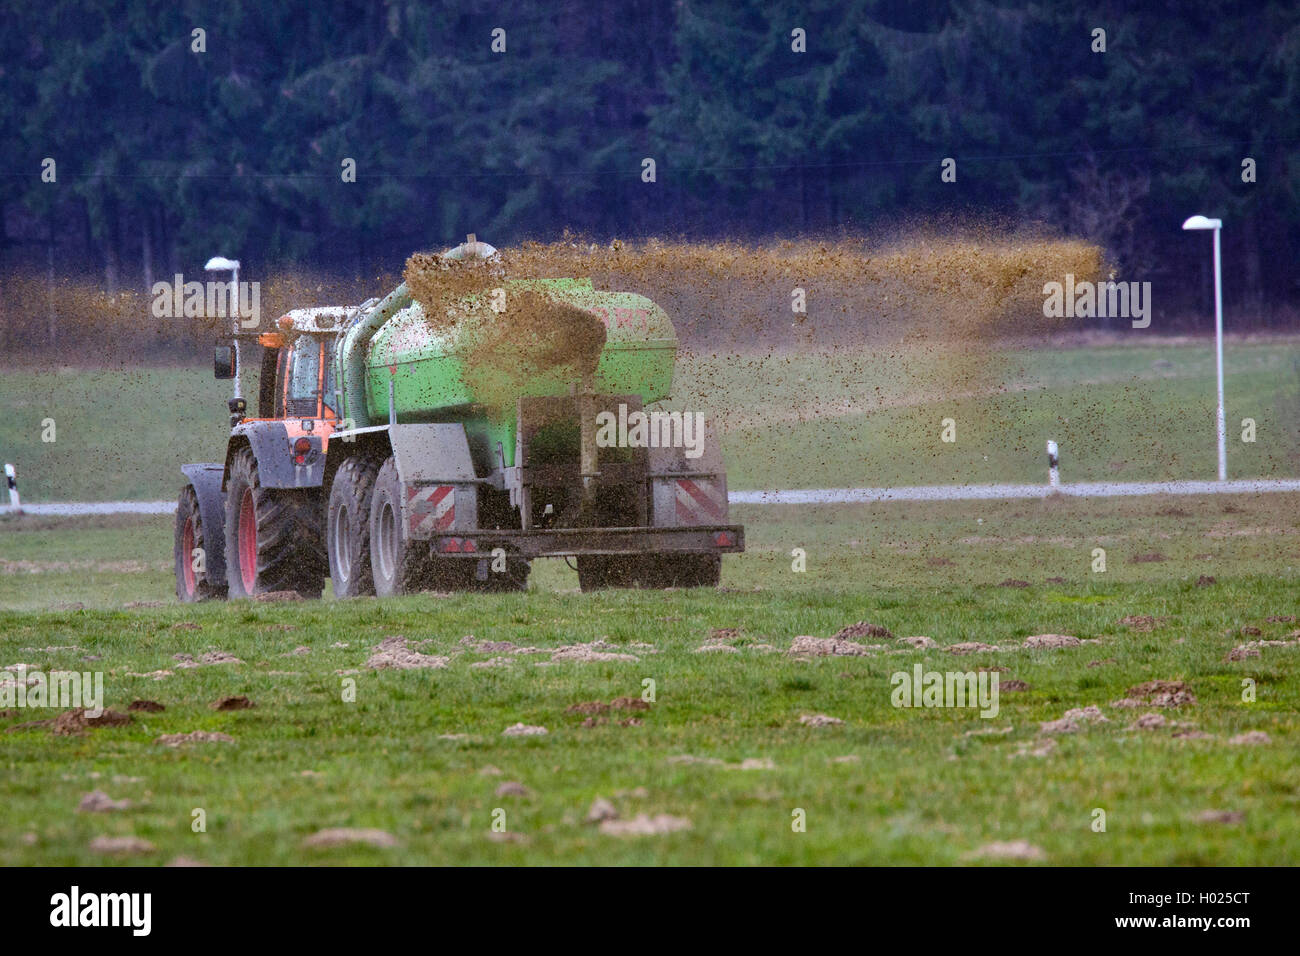 Landwirt bringt Guelle aus, Deutschland, Bayern, Oberbayern | application of liquid manure, Germany, Bavaria, Oberbayern, - Stock Image